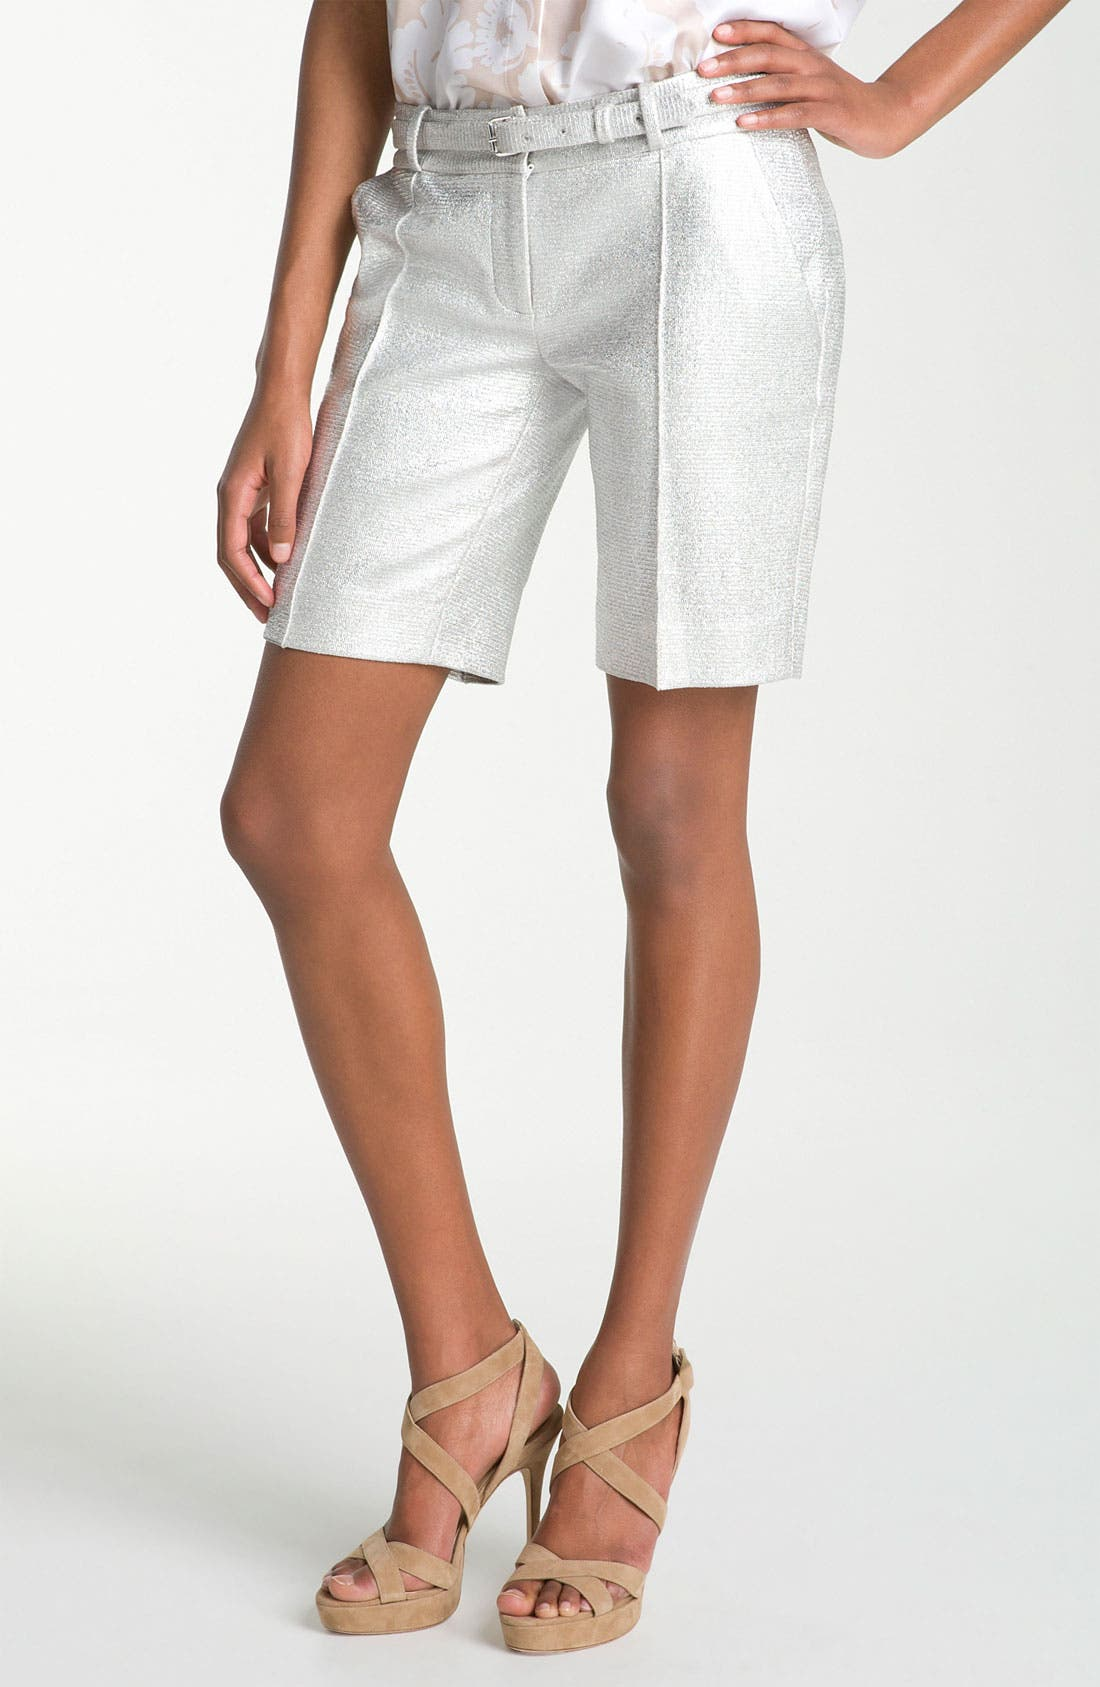 Alternate Image 1 Selected - Diane von Furstenberg 'New Boymuda' Shorts